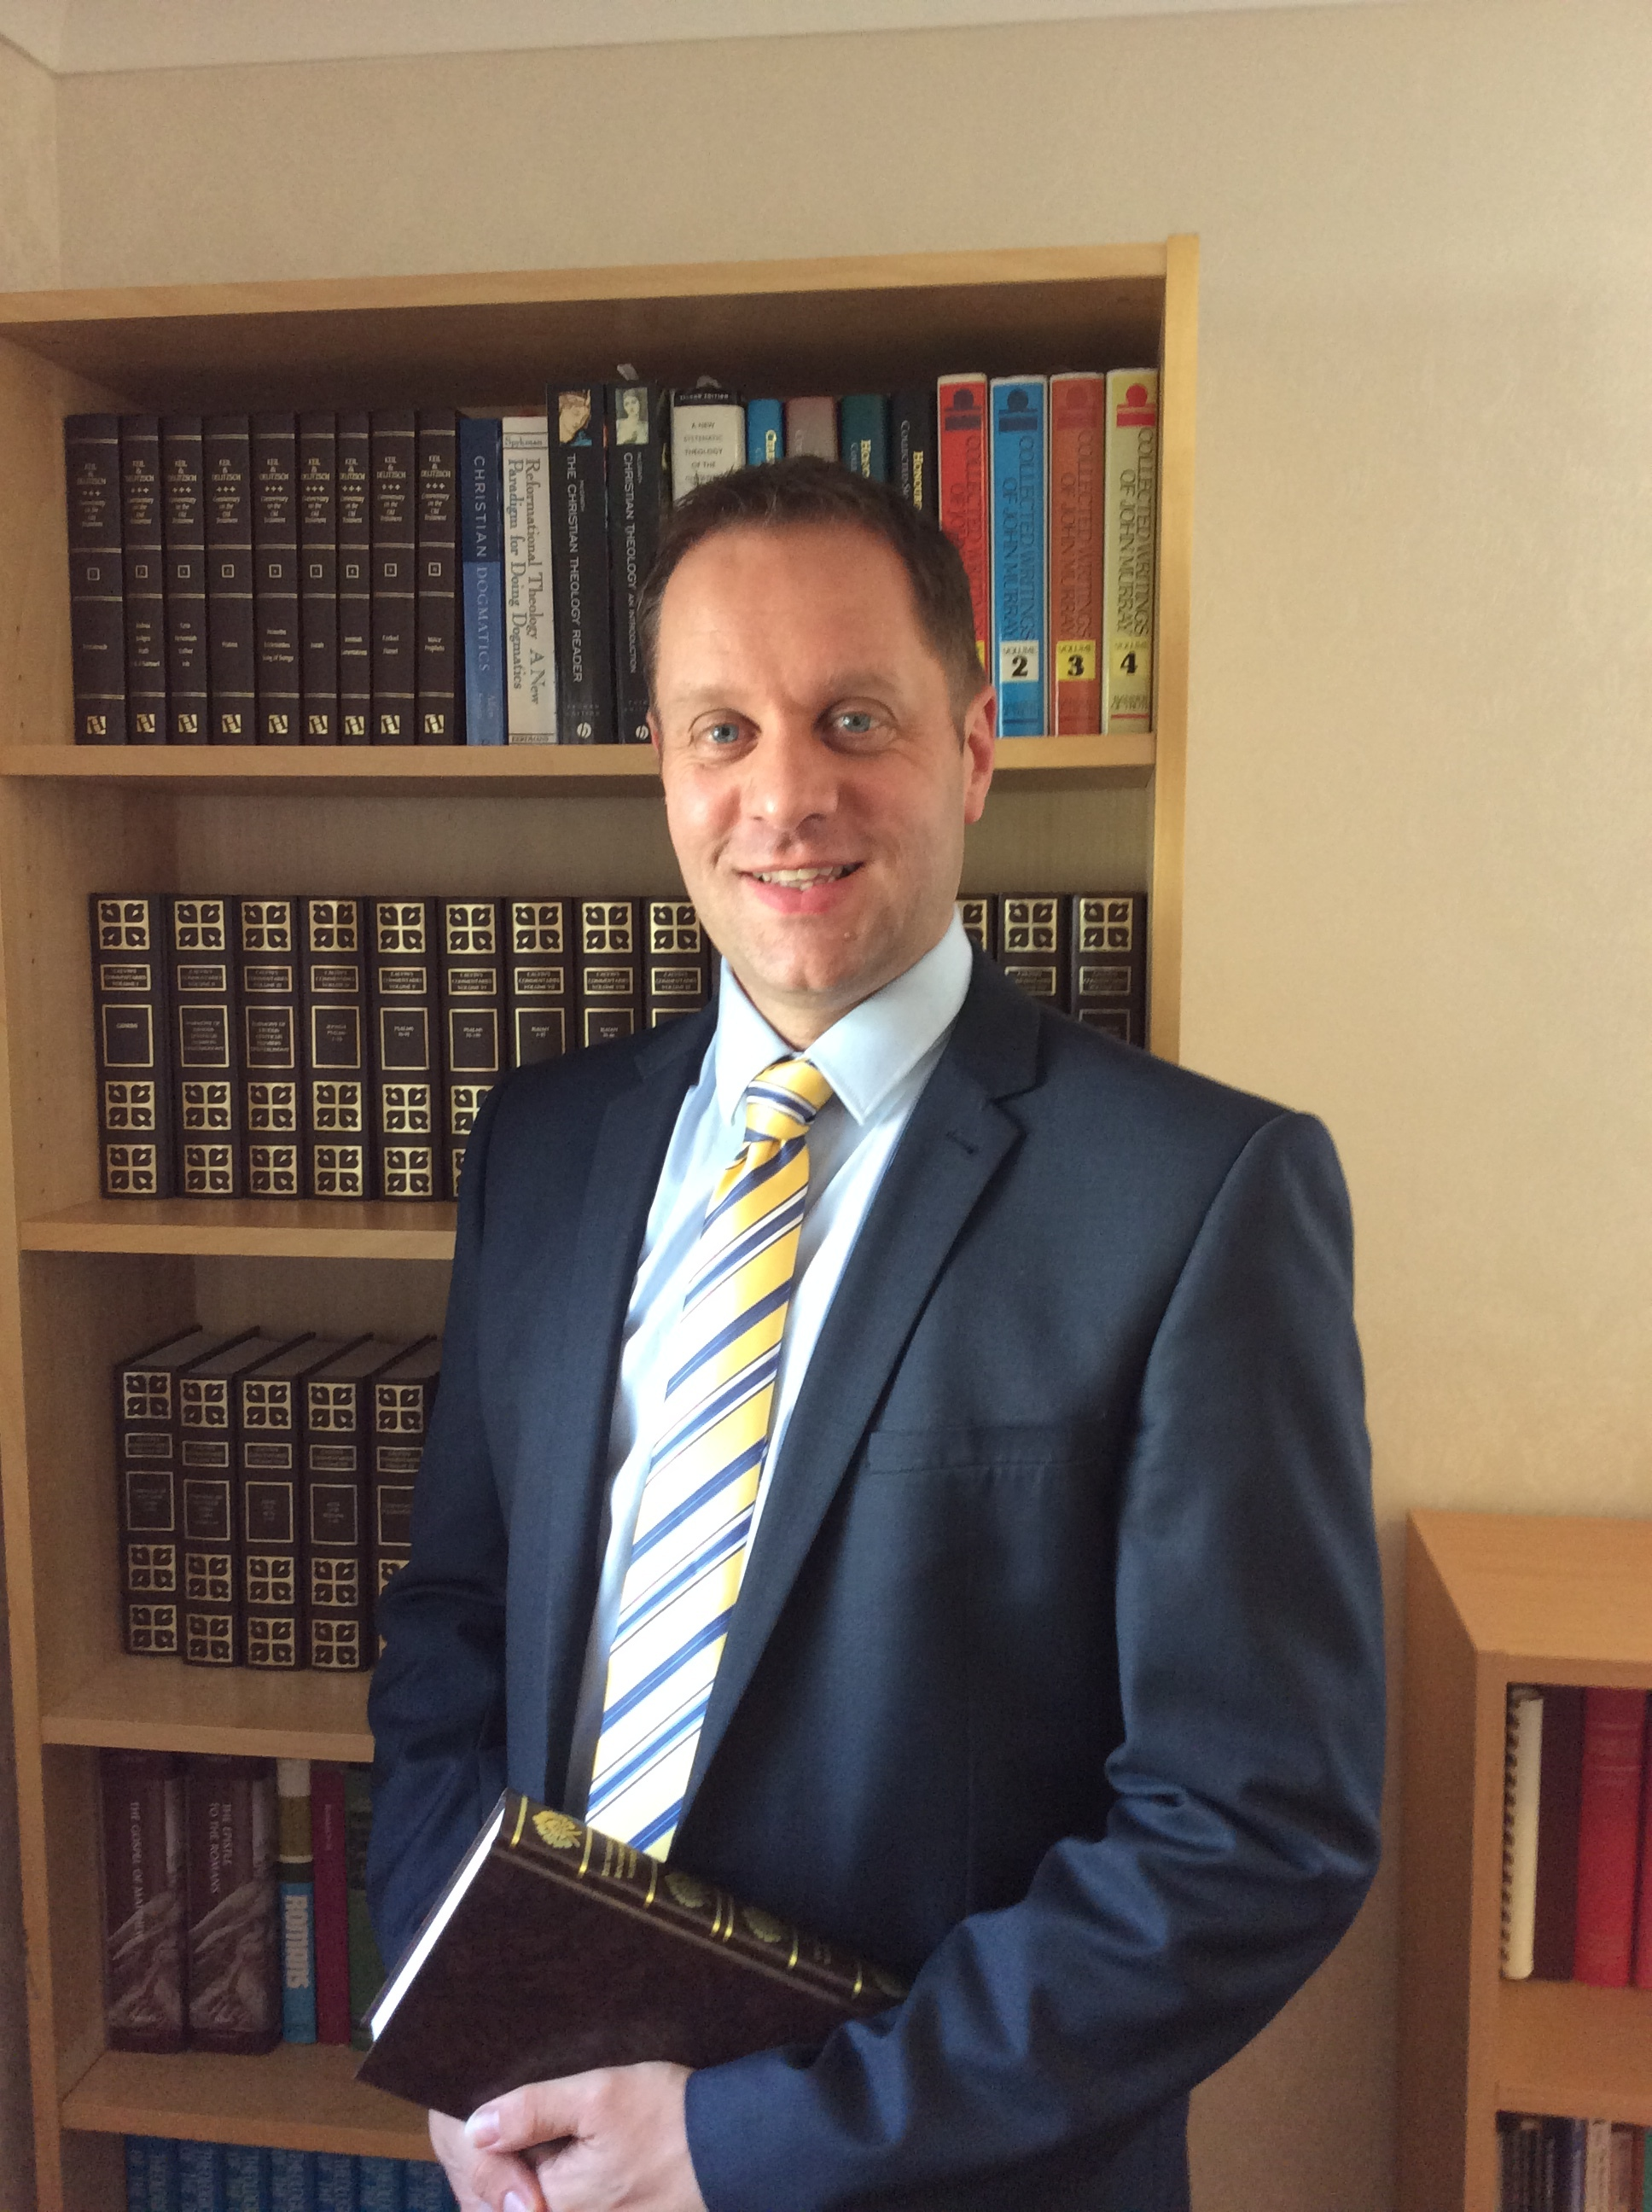 Rev. Philip Haines    Director,Greystone Cardiff  Minister, Ely Presbyterian Church